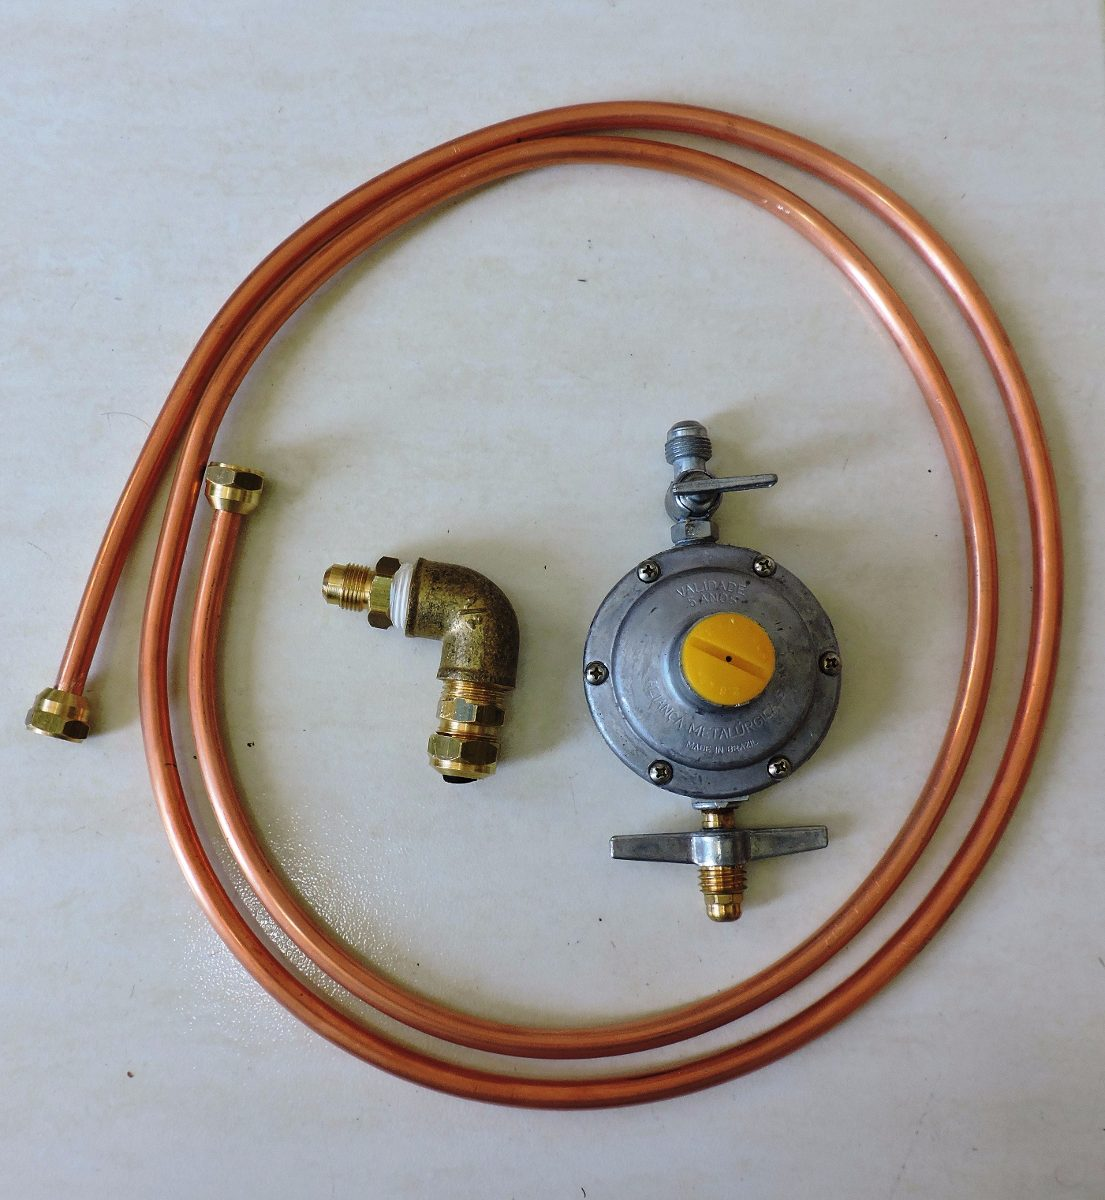 Tubo de cobre 3 8 39 gas 5mts registro adaptadores - Tubo de cobre para gas ...